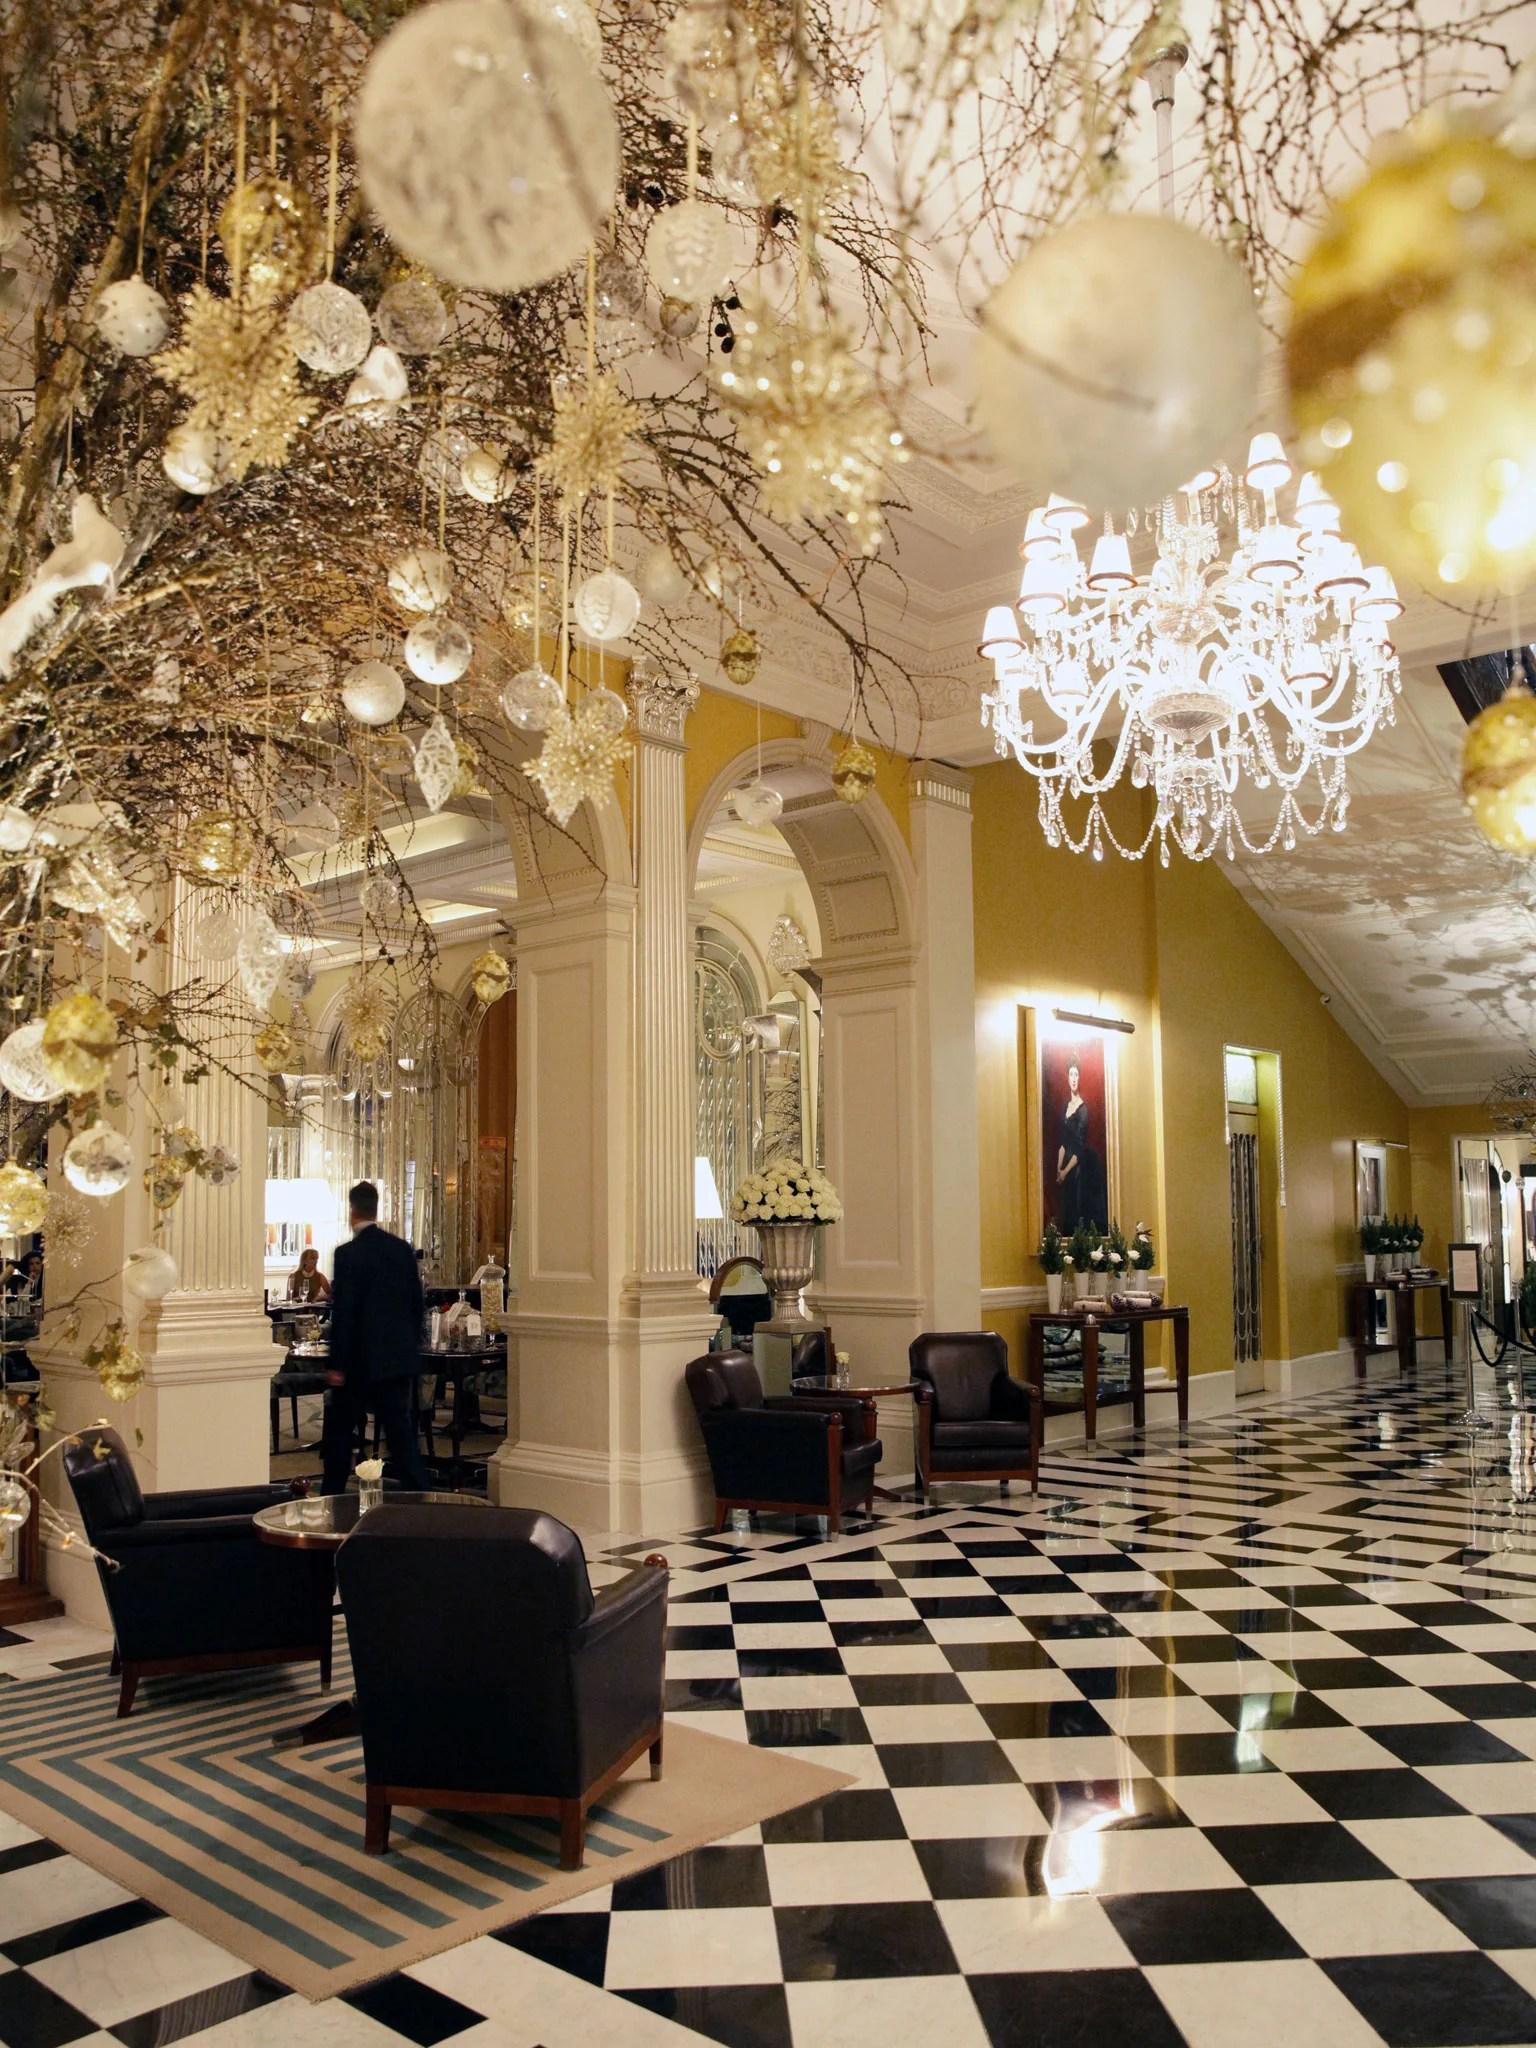 Claridges An opulent hotel where every polished corner